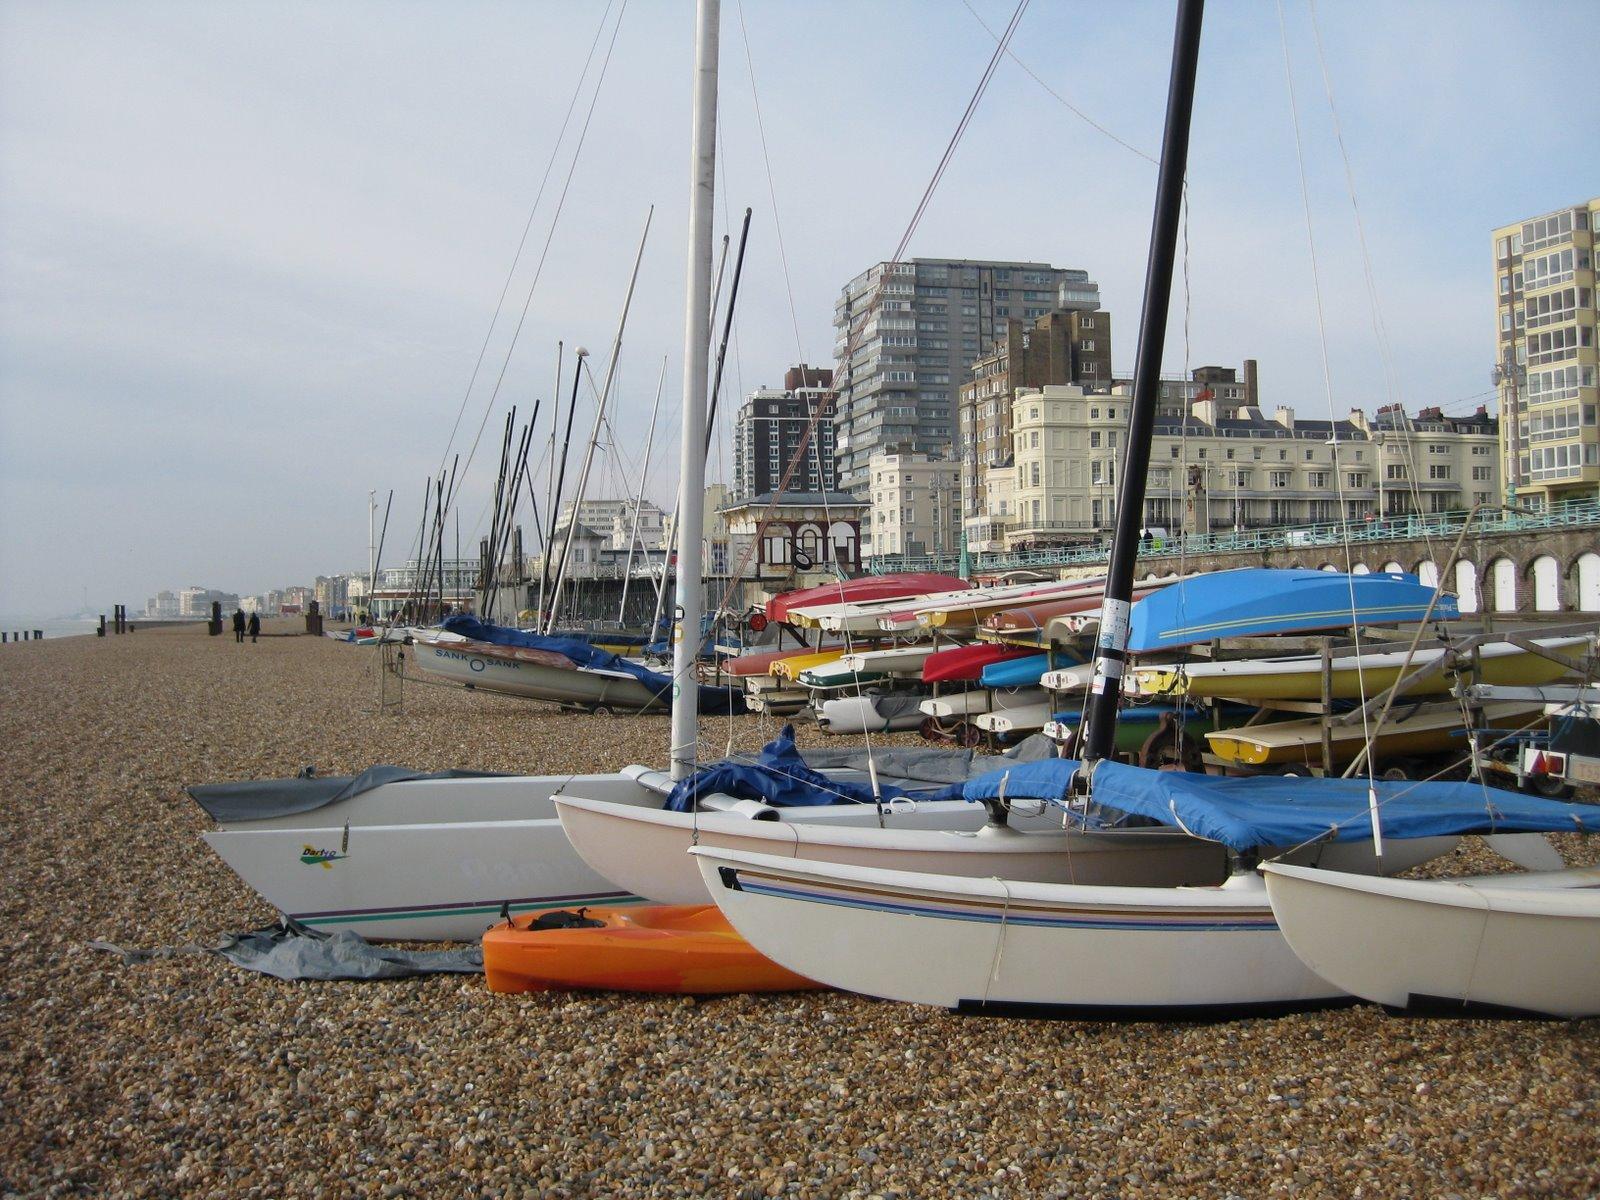 brighton seafront boat beach hove united kingdom travel planning trip